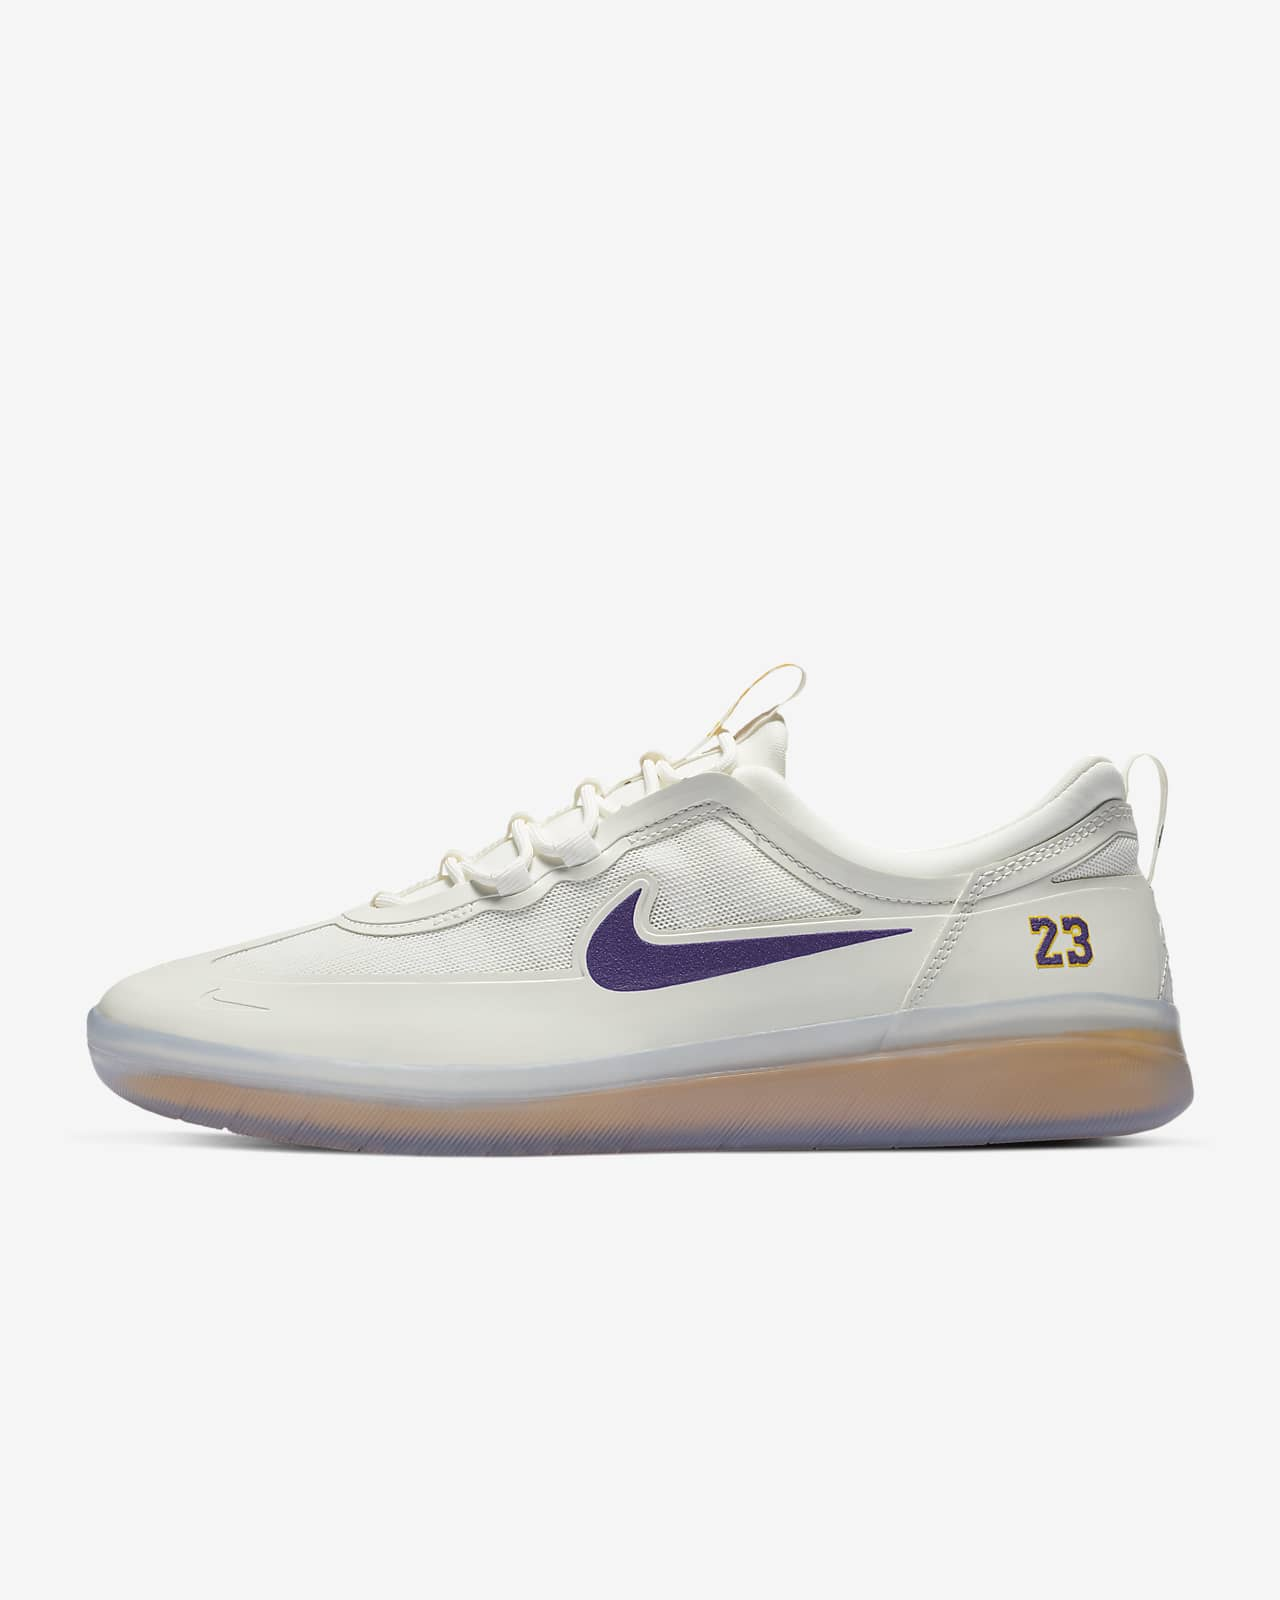 Chaussure de skateboard Nike SB Nyjah Free 2 NBA